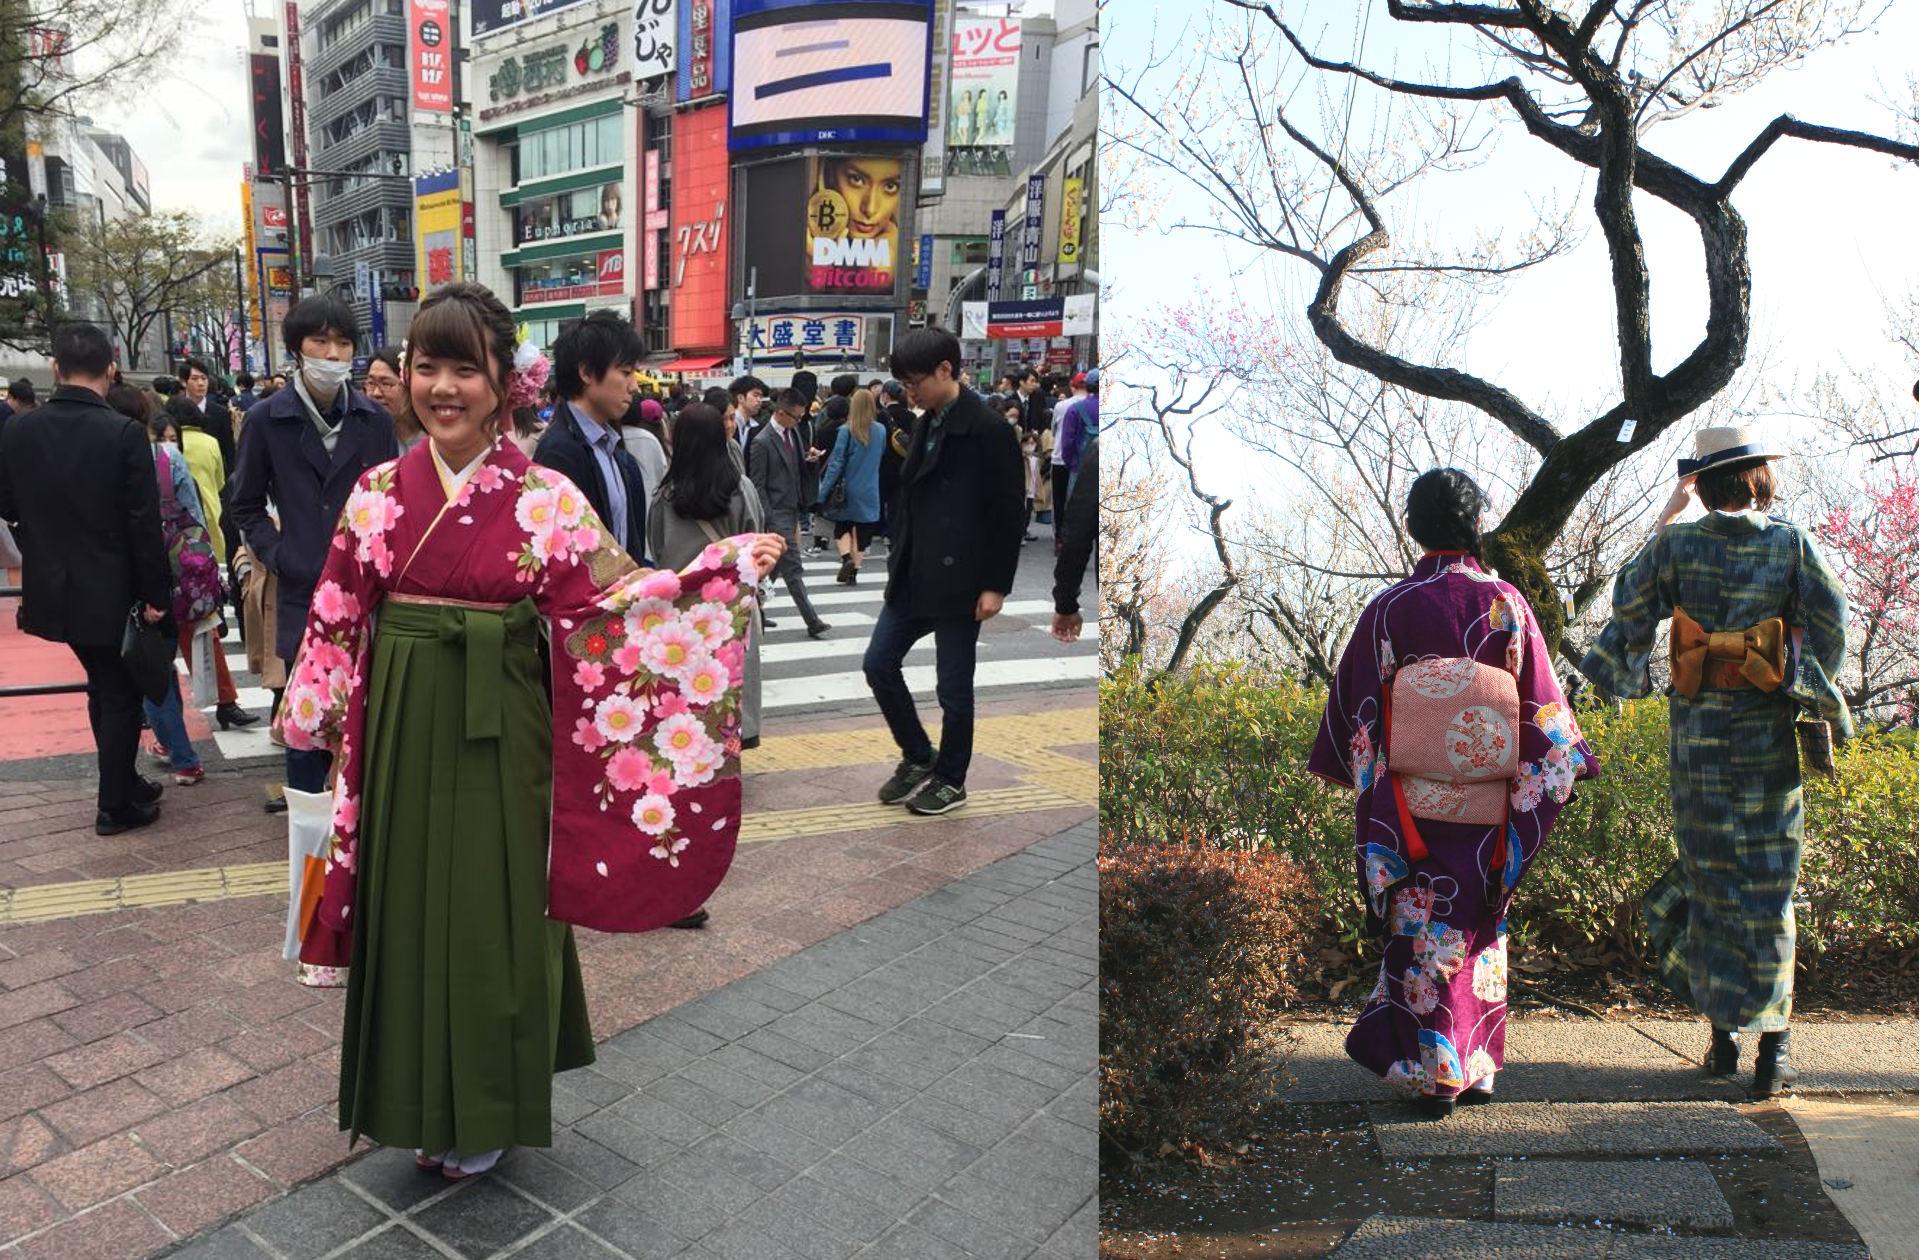 tokio japonia tokyo japan kimono tradition japanesewomaniglawpodrozy